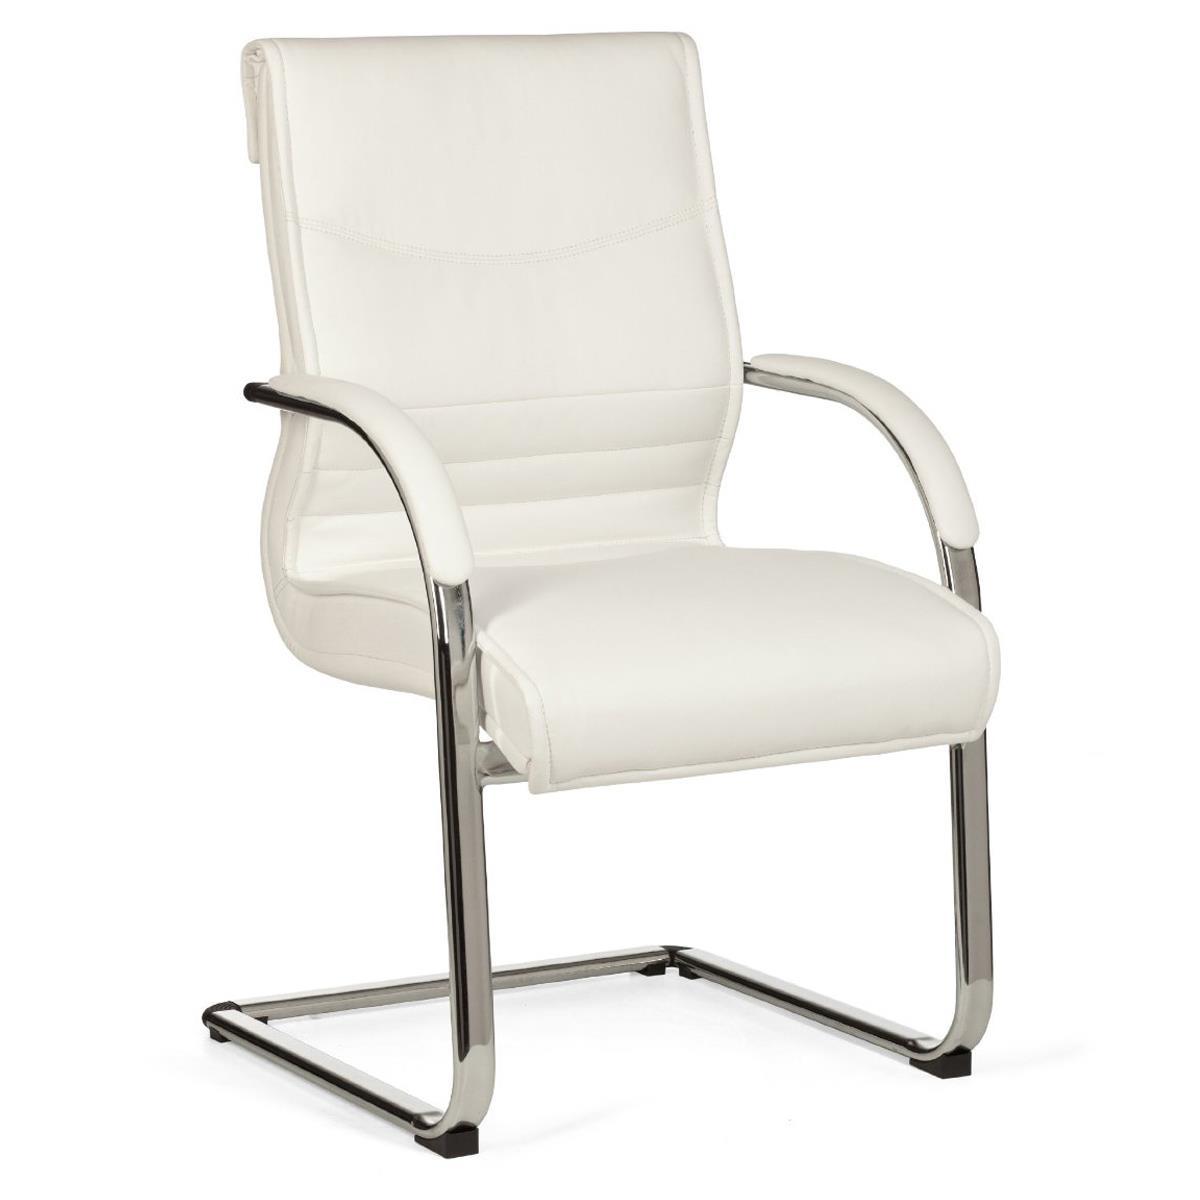 Stunning sedia ergonomica sala duattesa pindo comoda - Sedia ergonomica prezzi ...